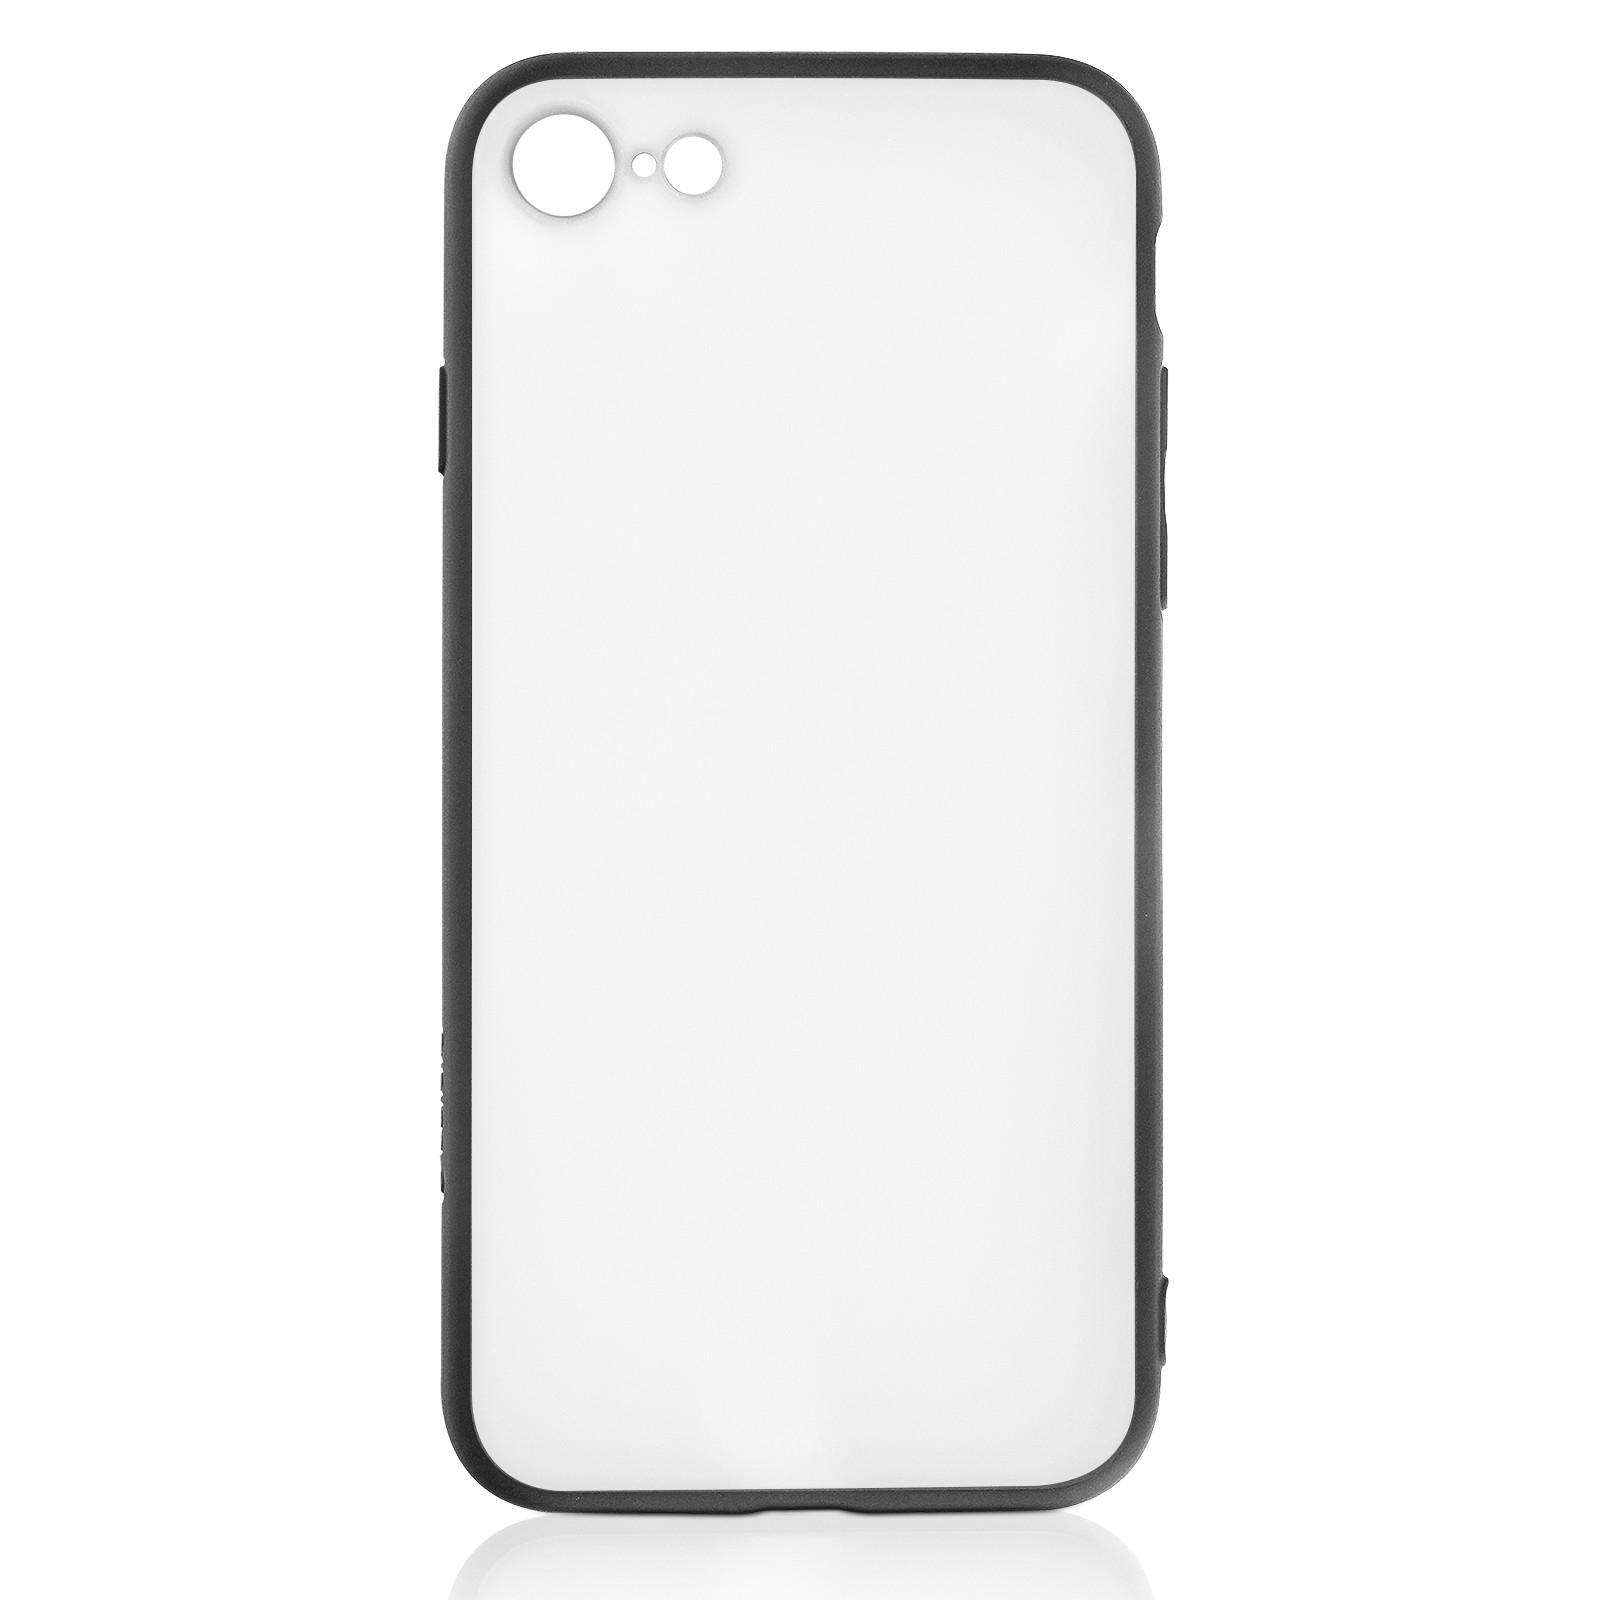 Capac protectie spate cellara colectia shade pentru iphone 7/8/se2 - negru